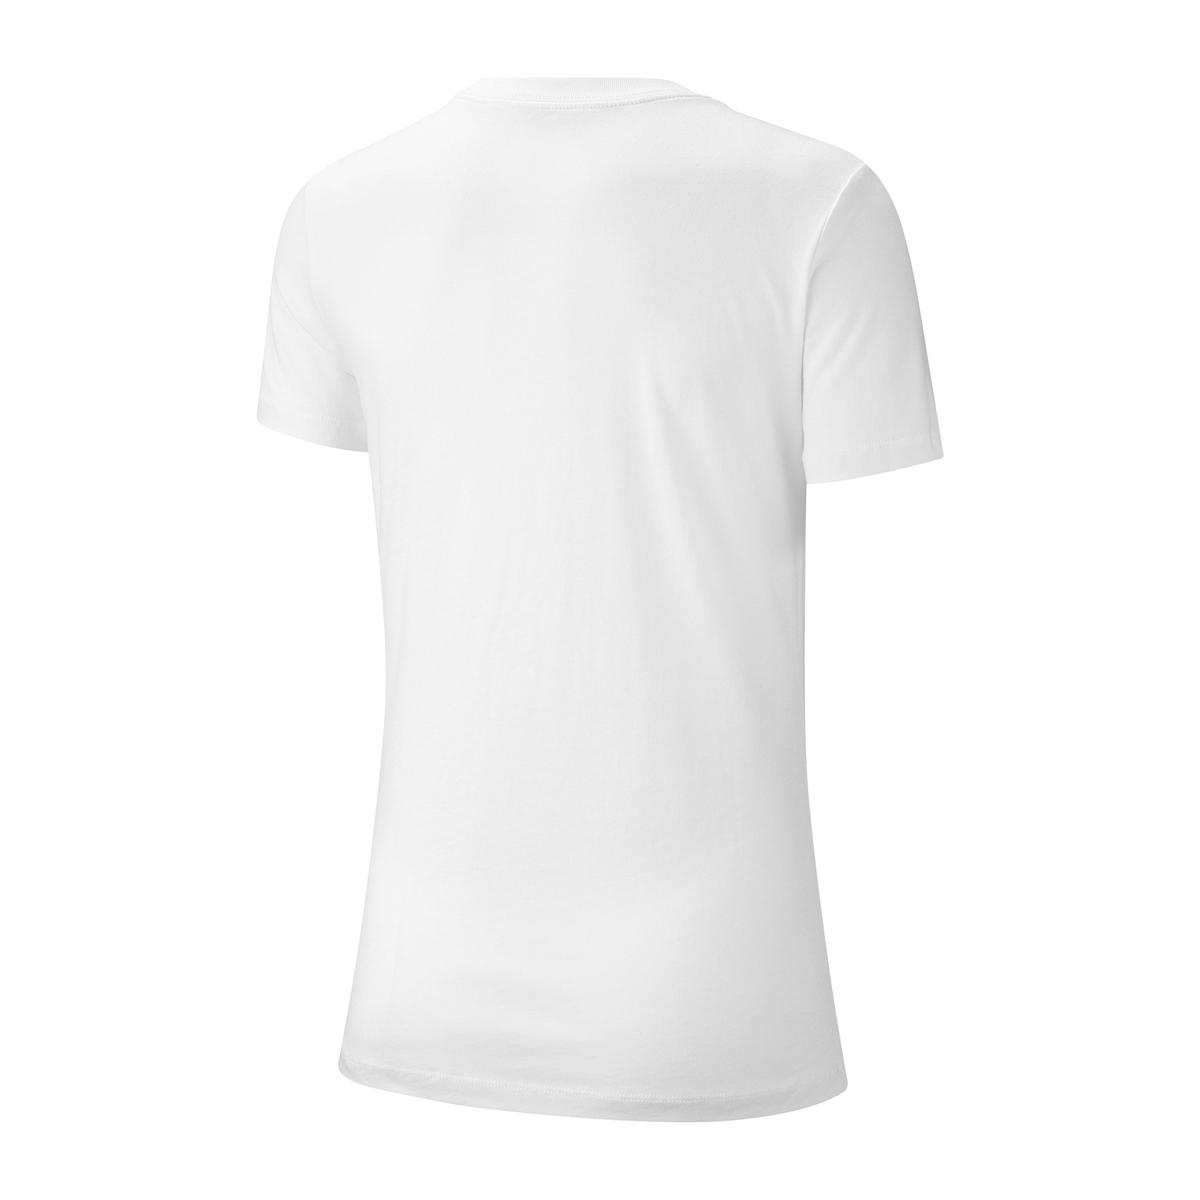 Imagen secundaria de producto de Camiseta Sportswear BV6169-100 - Nike